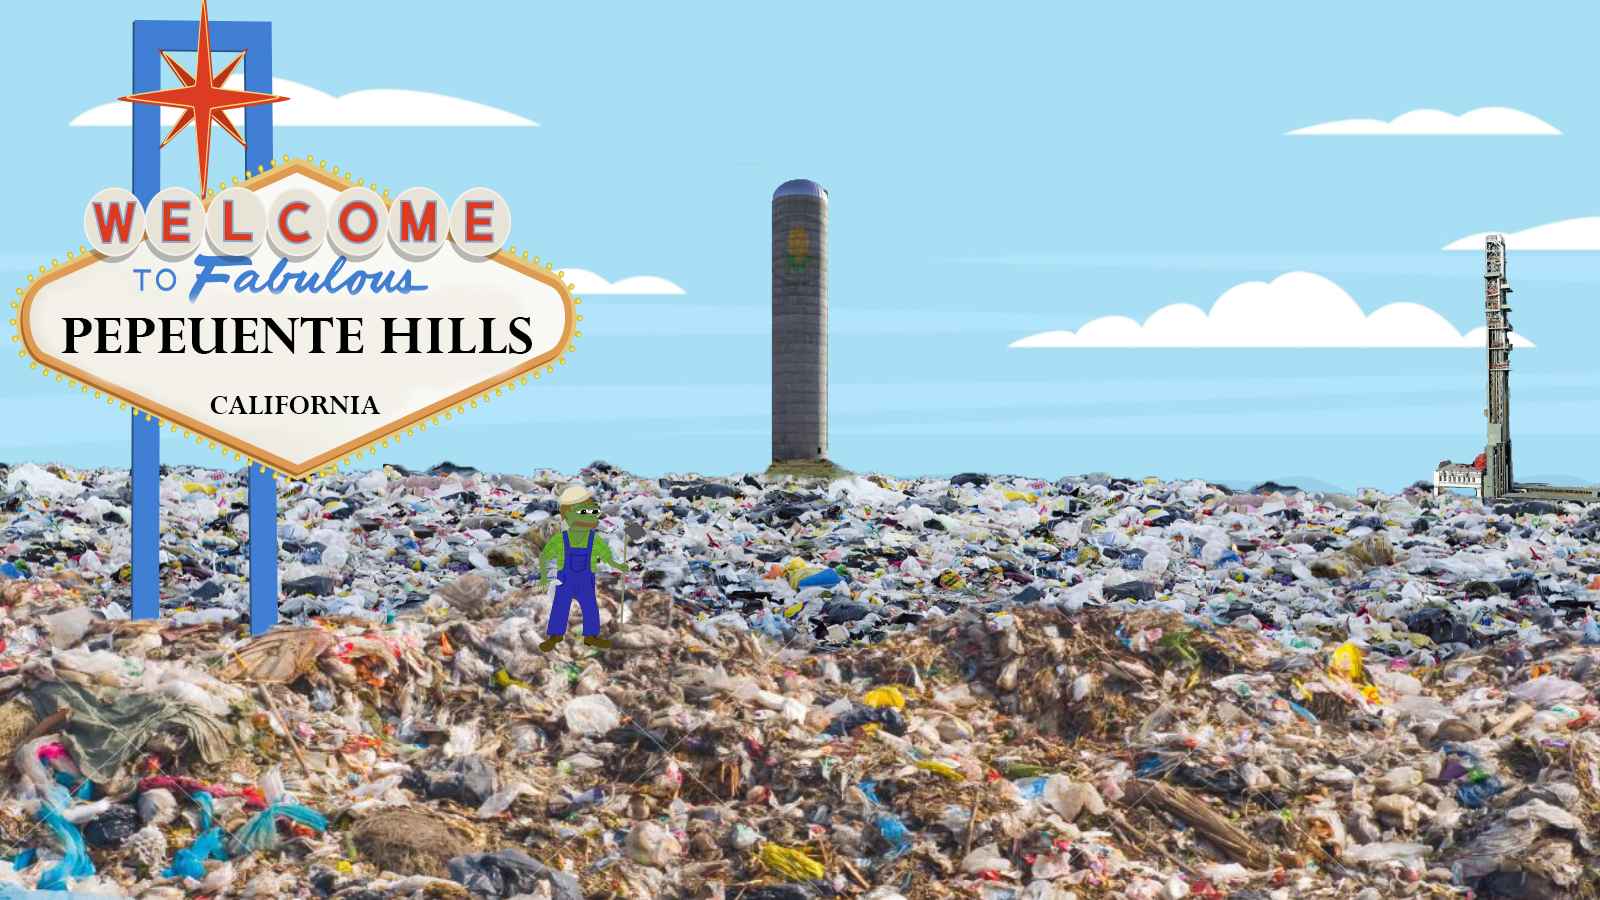 Pepeuente Hills Garbage Farm